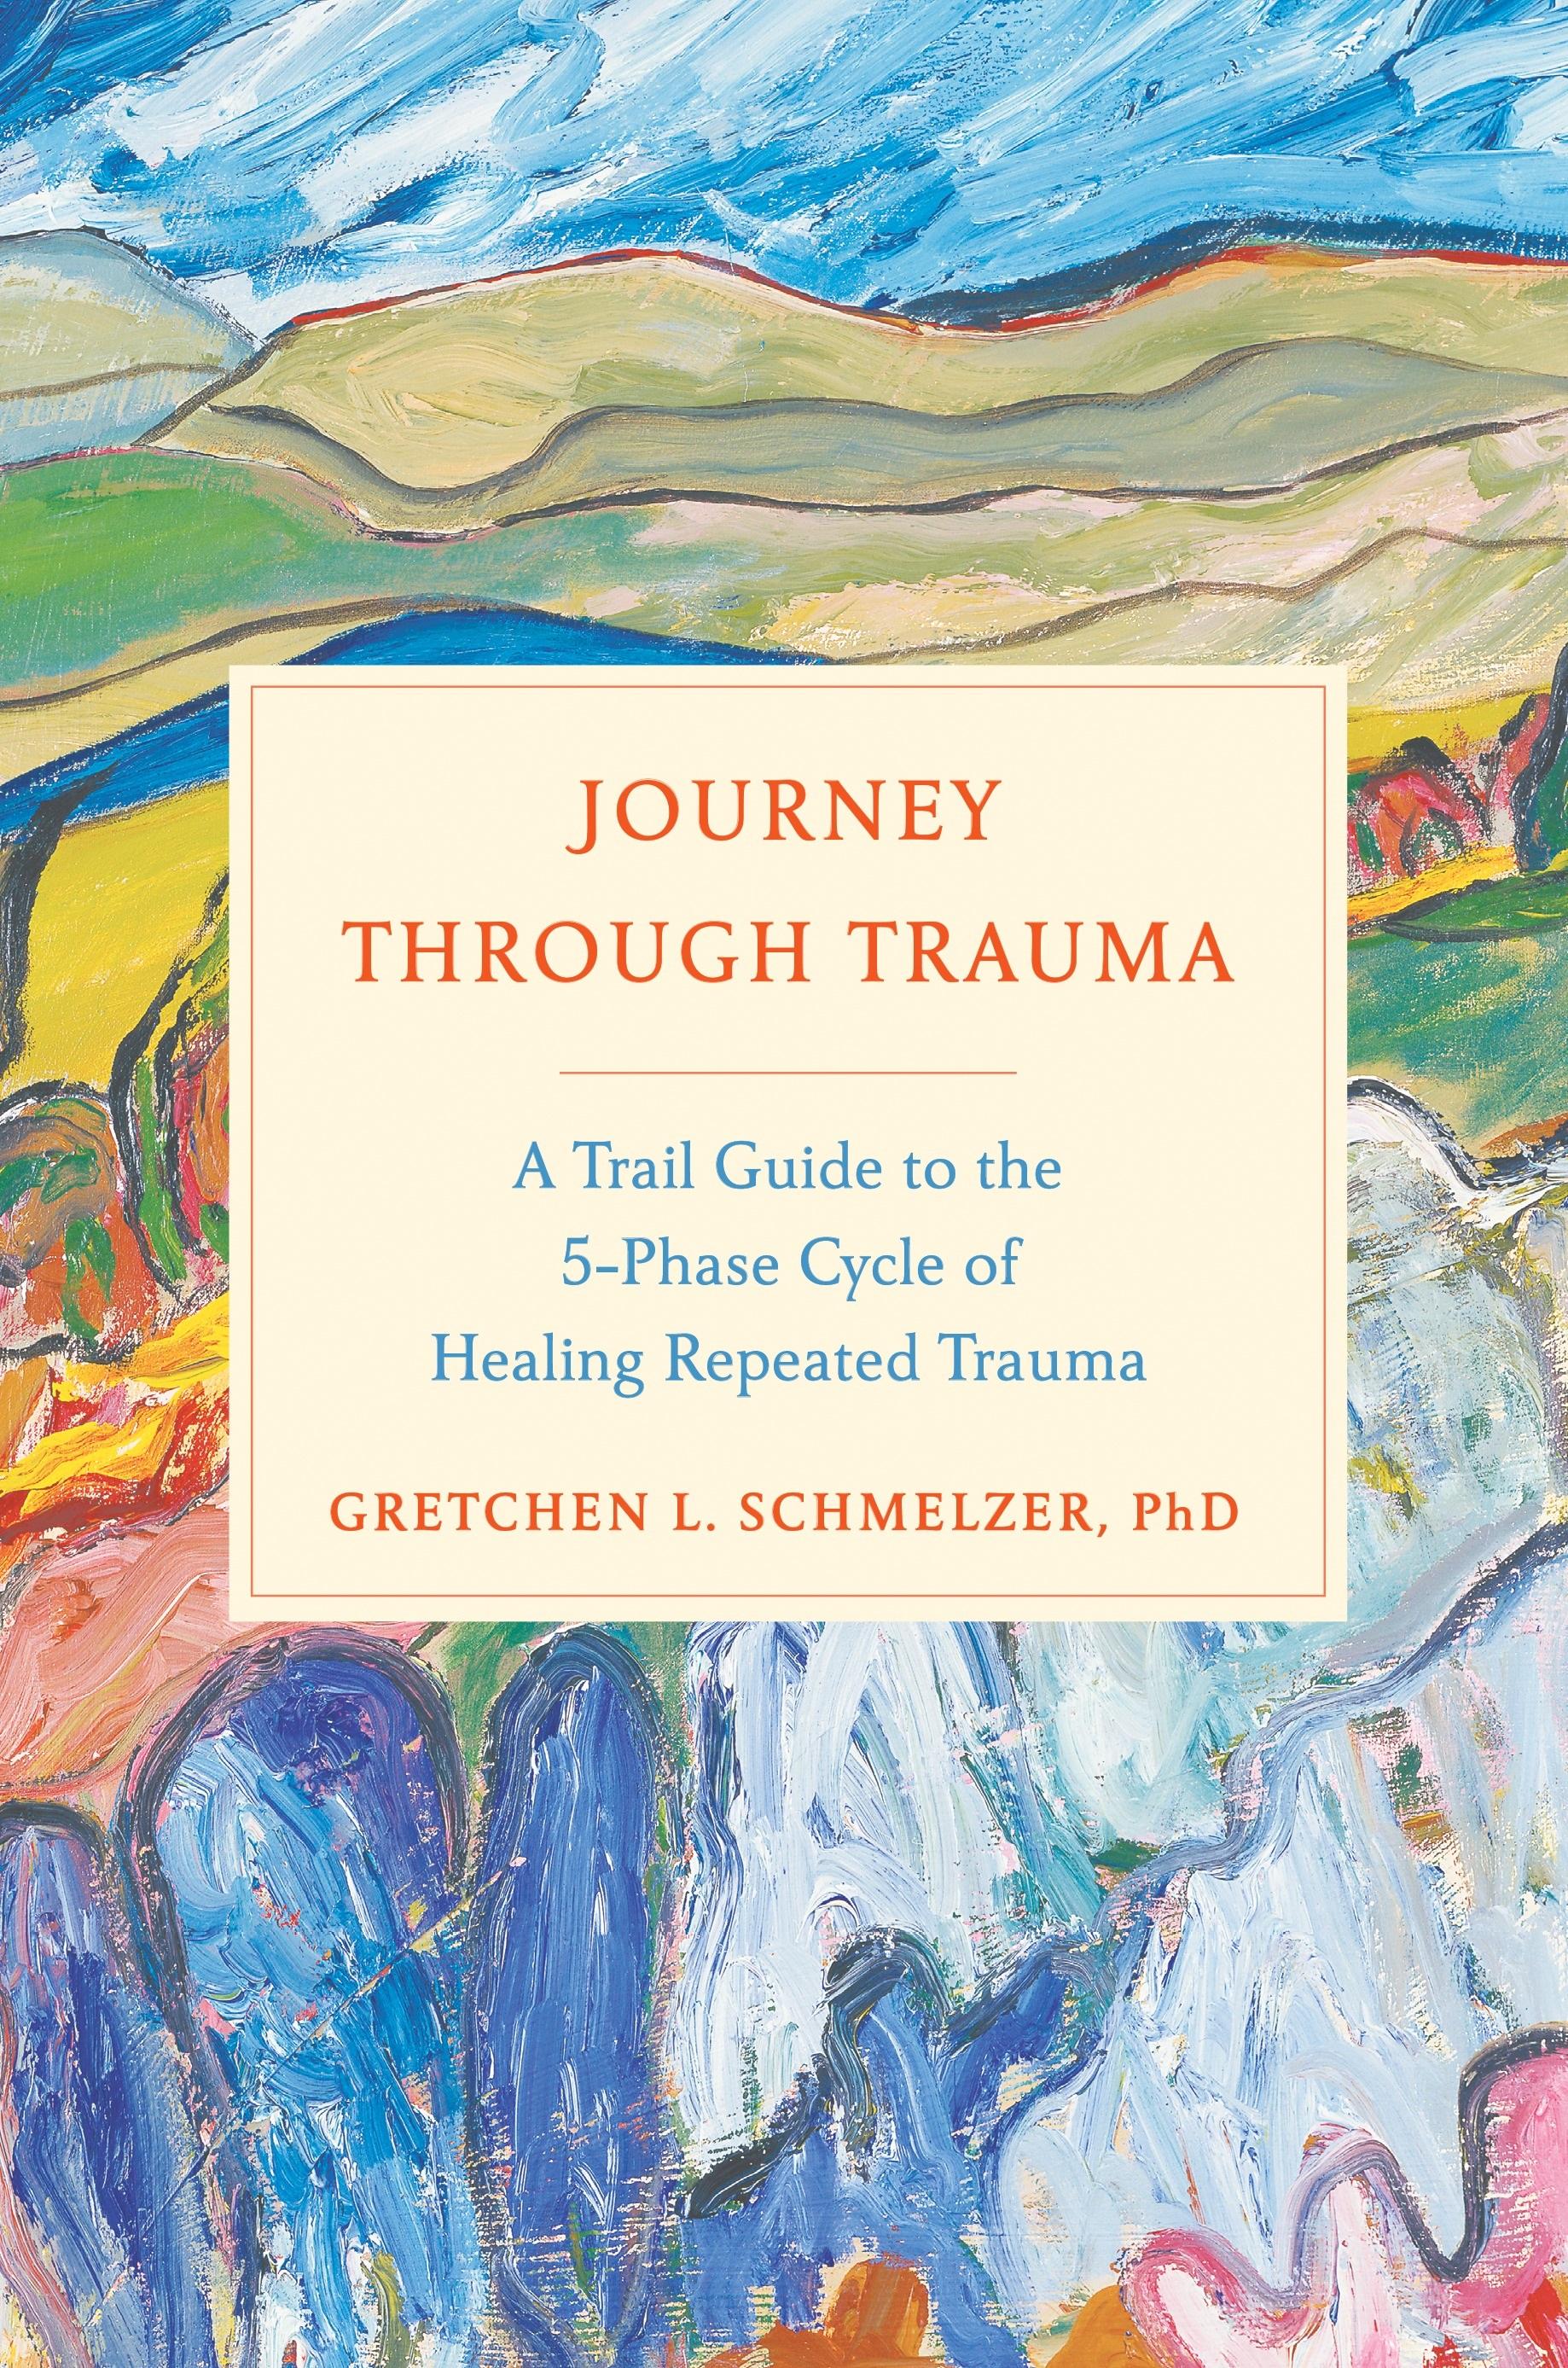 Journey Through Trauma jacket (1).jpg